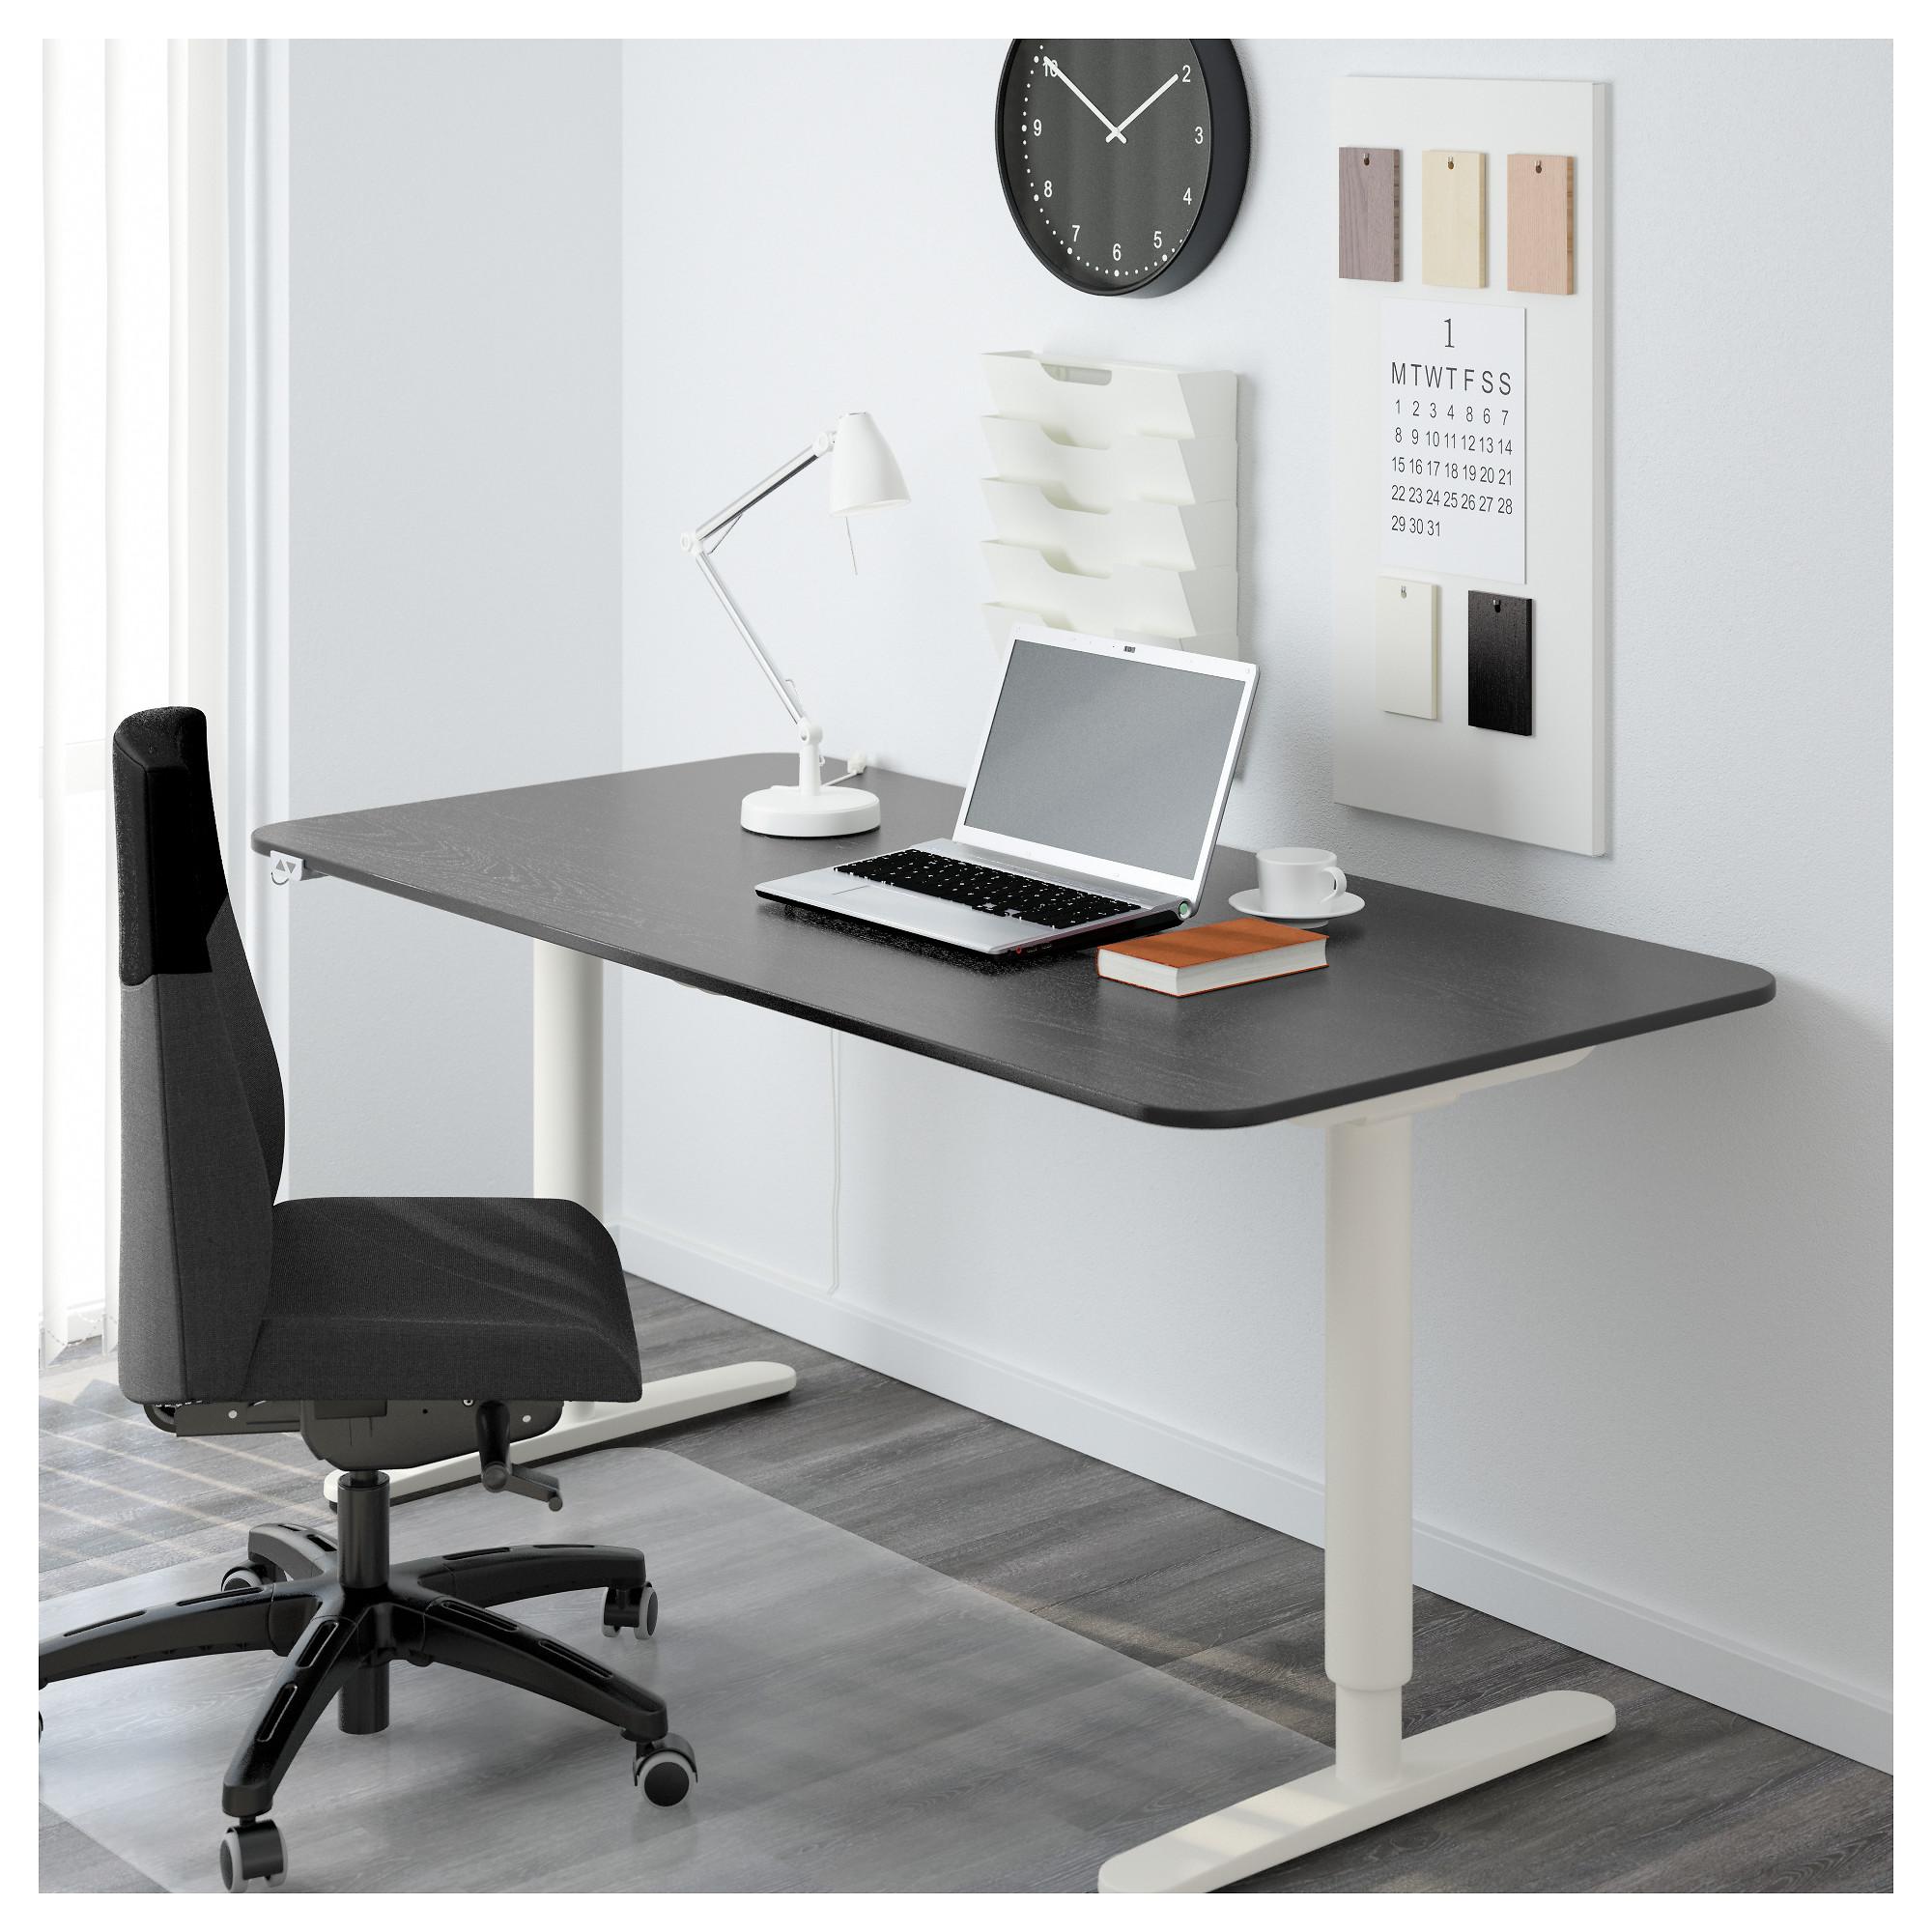 Стол трансформер БЕКАНТ белый артикуль № 992.786.83 в наличии. Онлайн каталог IKEA Минск. Недорогая доставка и монтаж.